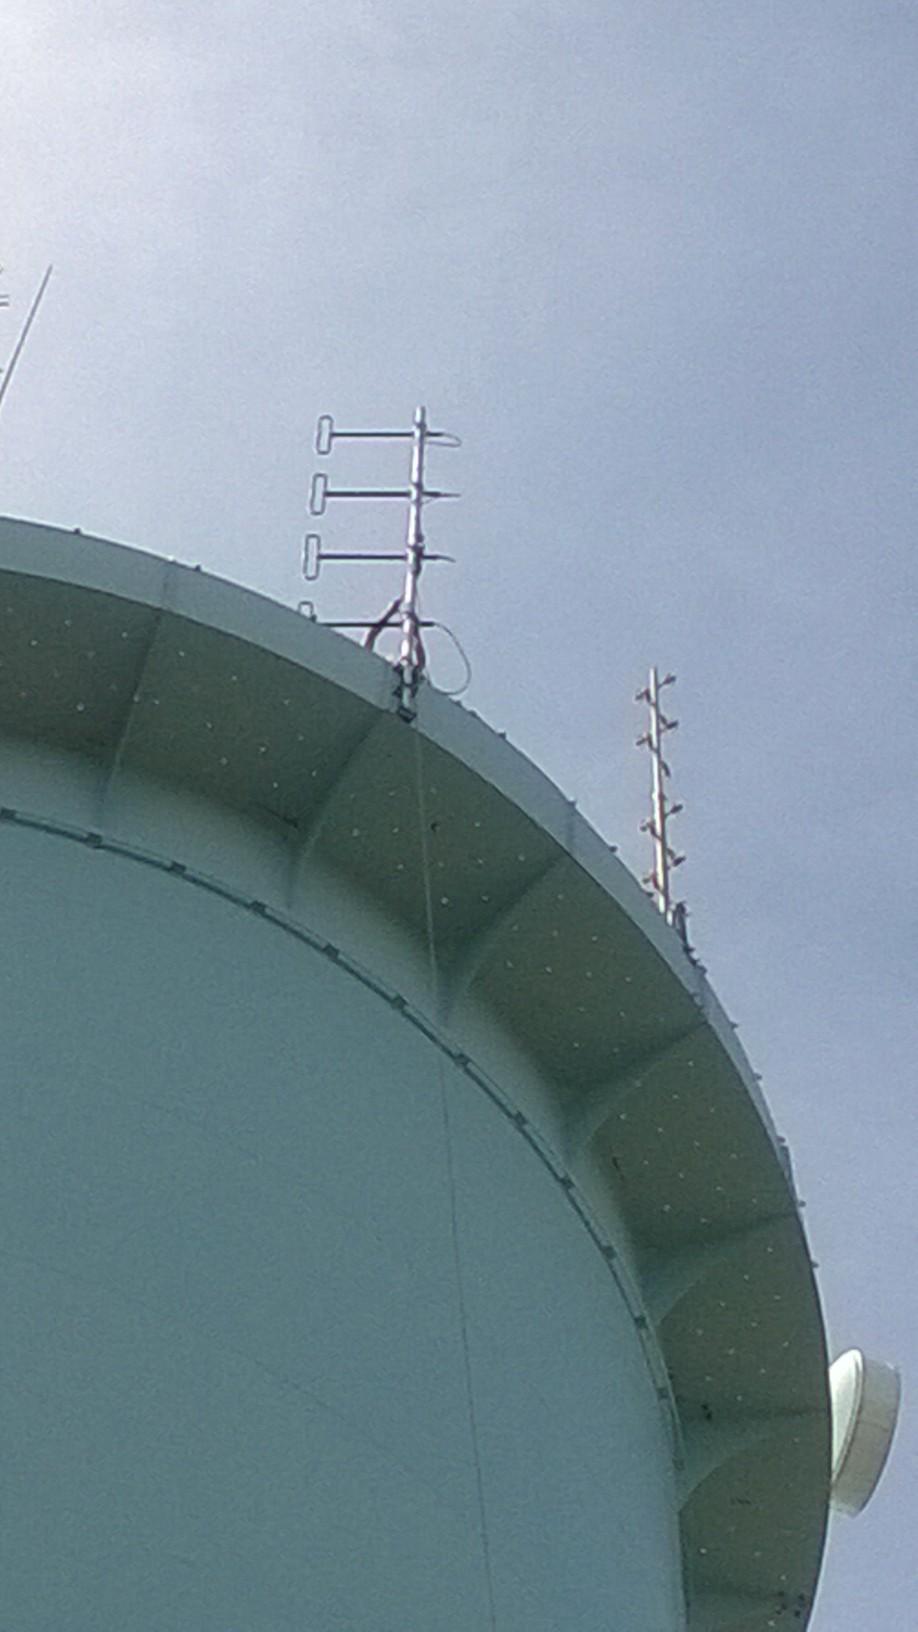 Bourne Telewave Antenna